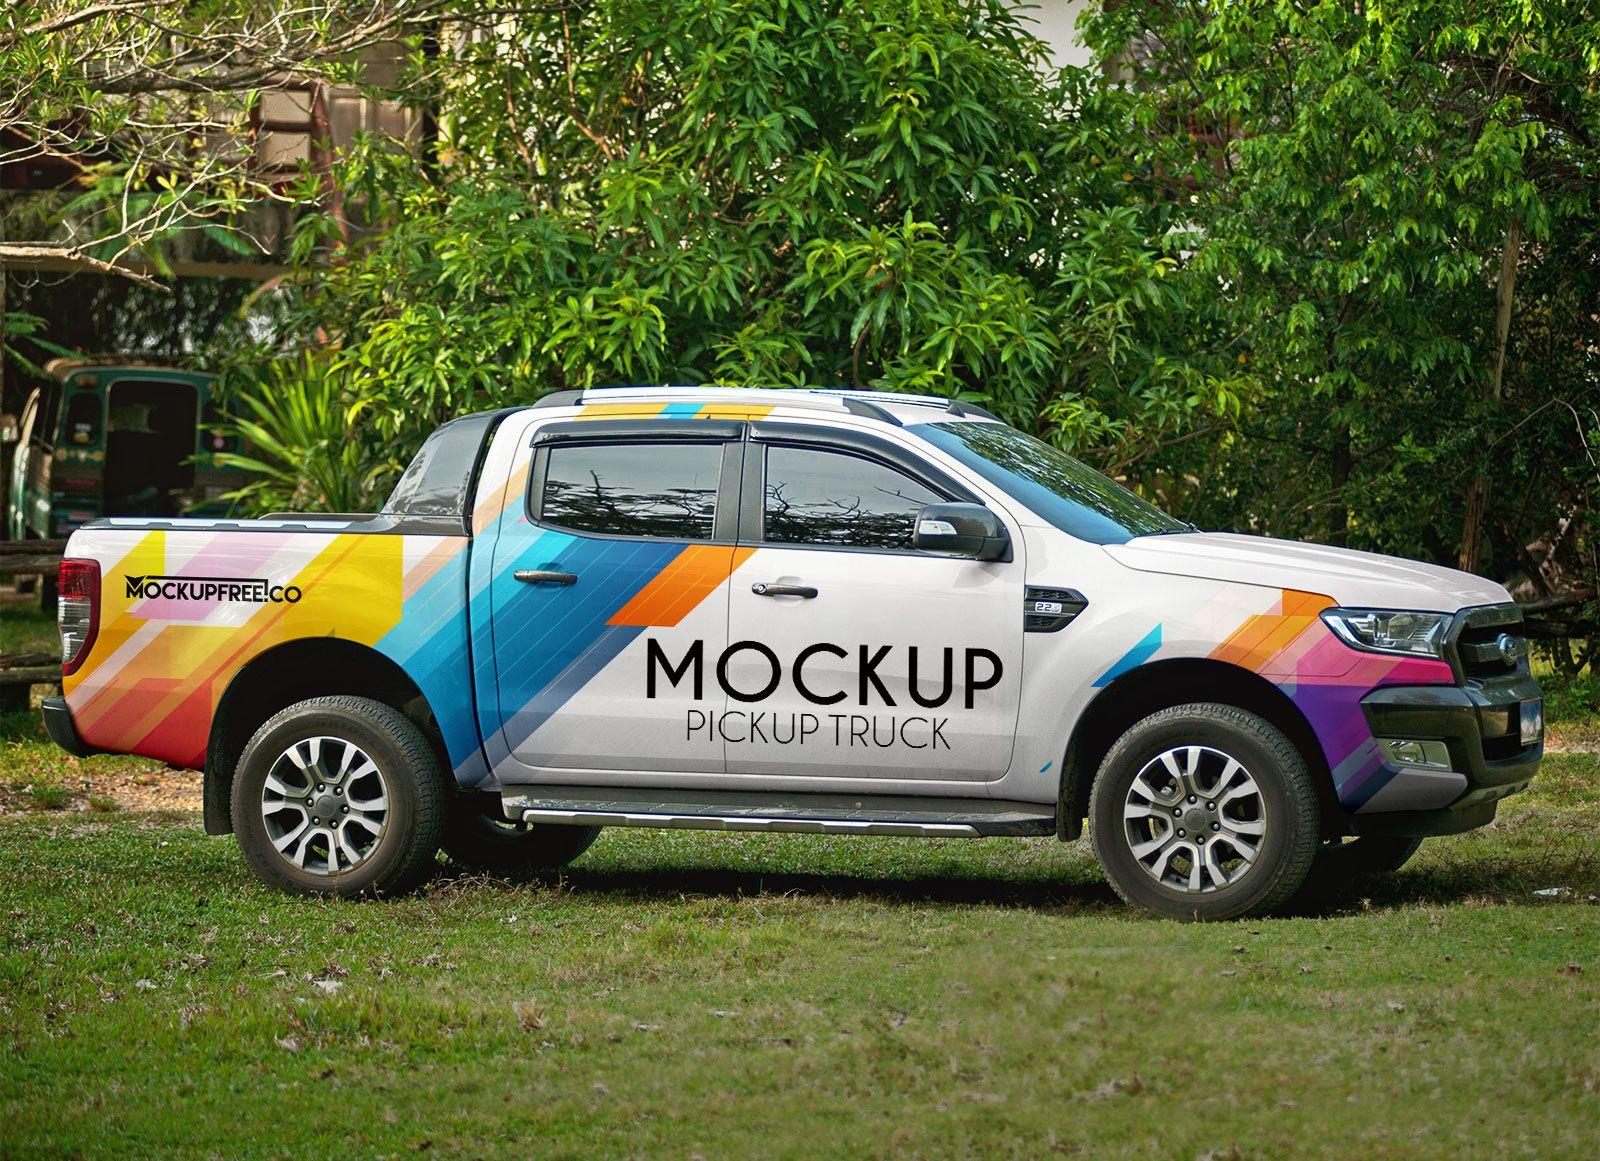 Download Free Vehicle Branding Pickup Truck Mockup Psd Mockup Free Psd Mockup Psd Pickup Trucks PSD Mockup Templates